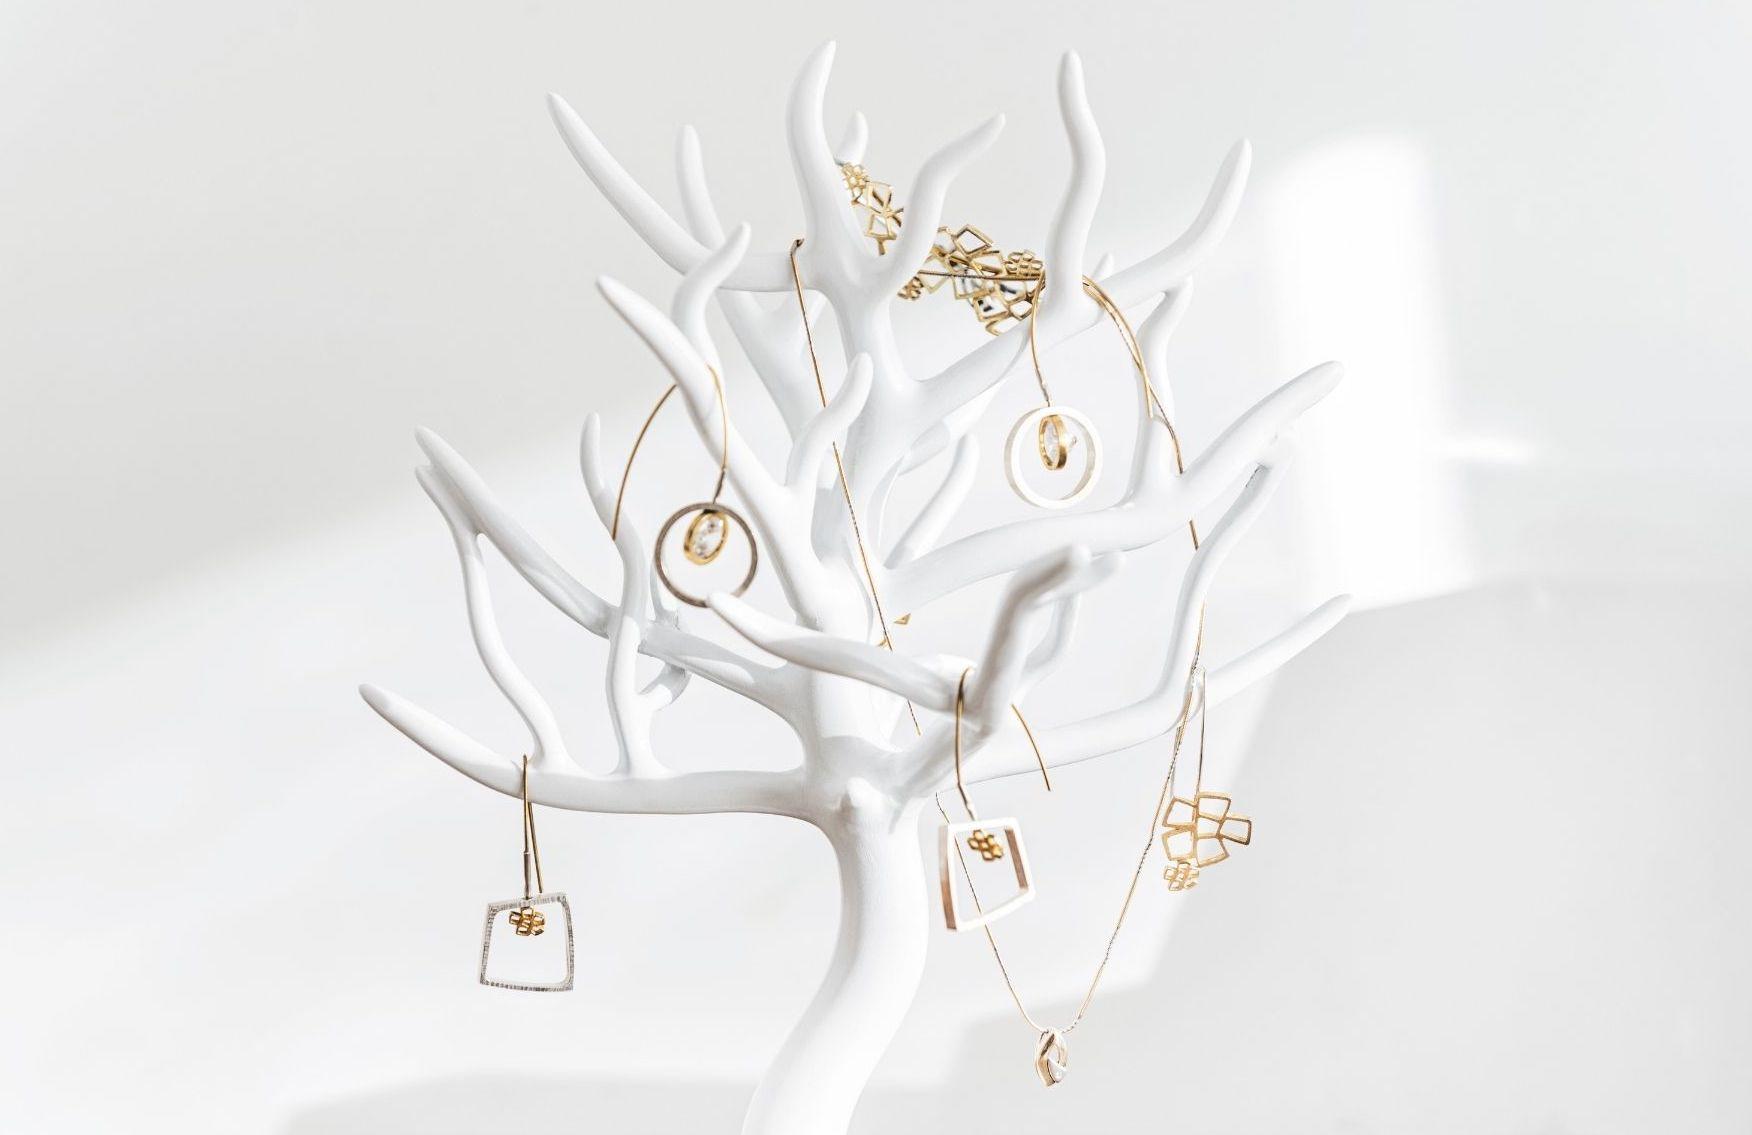 How to Organize Jewelry – Jewelry Organization Ideas and Tips